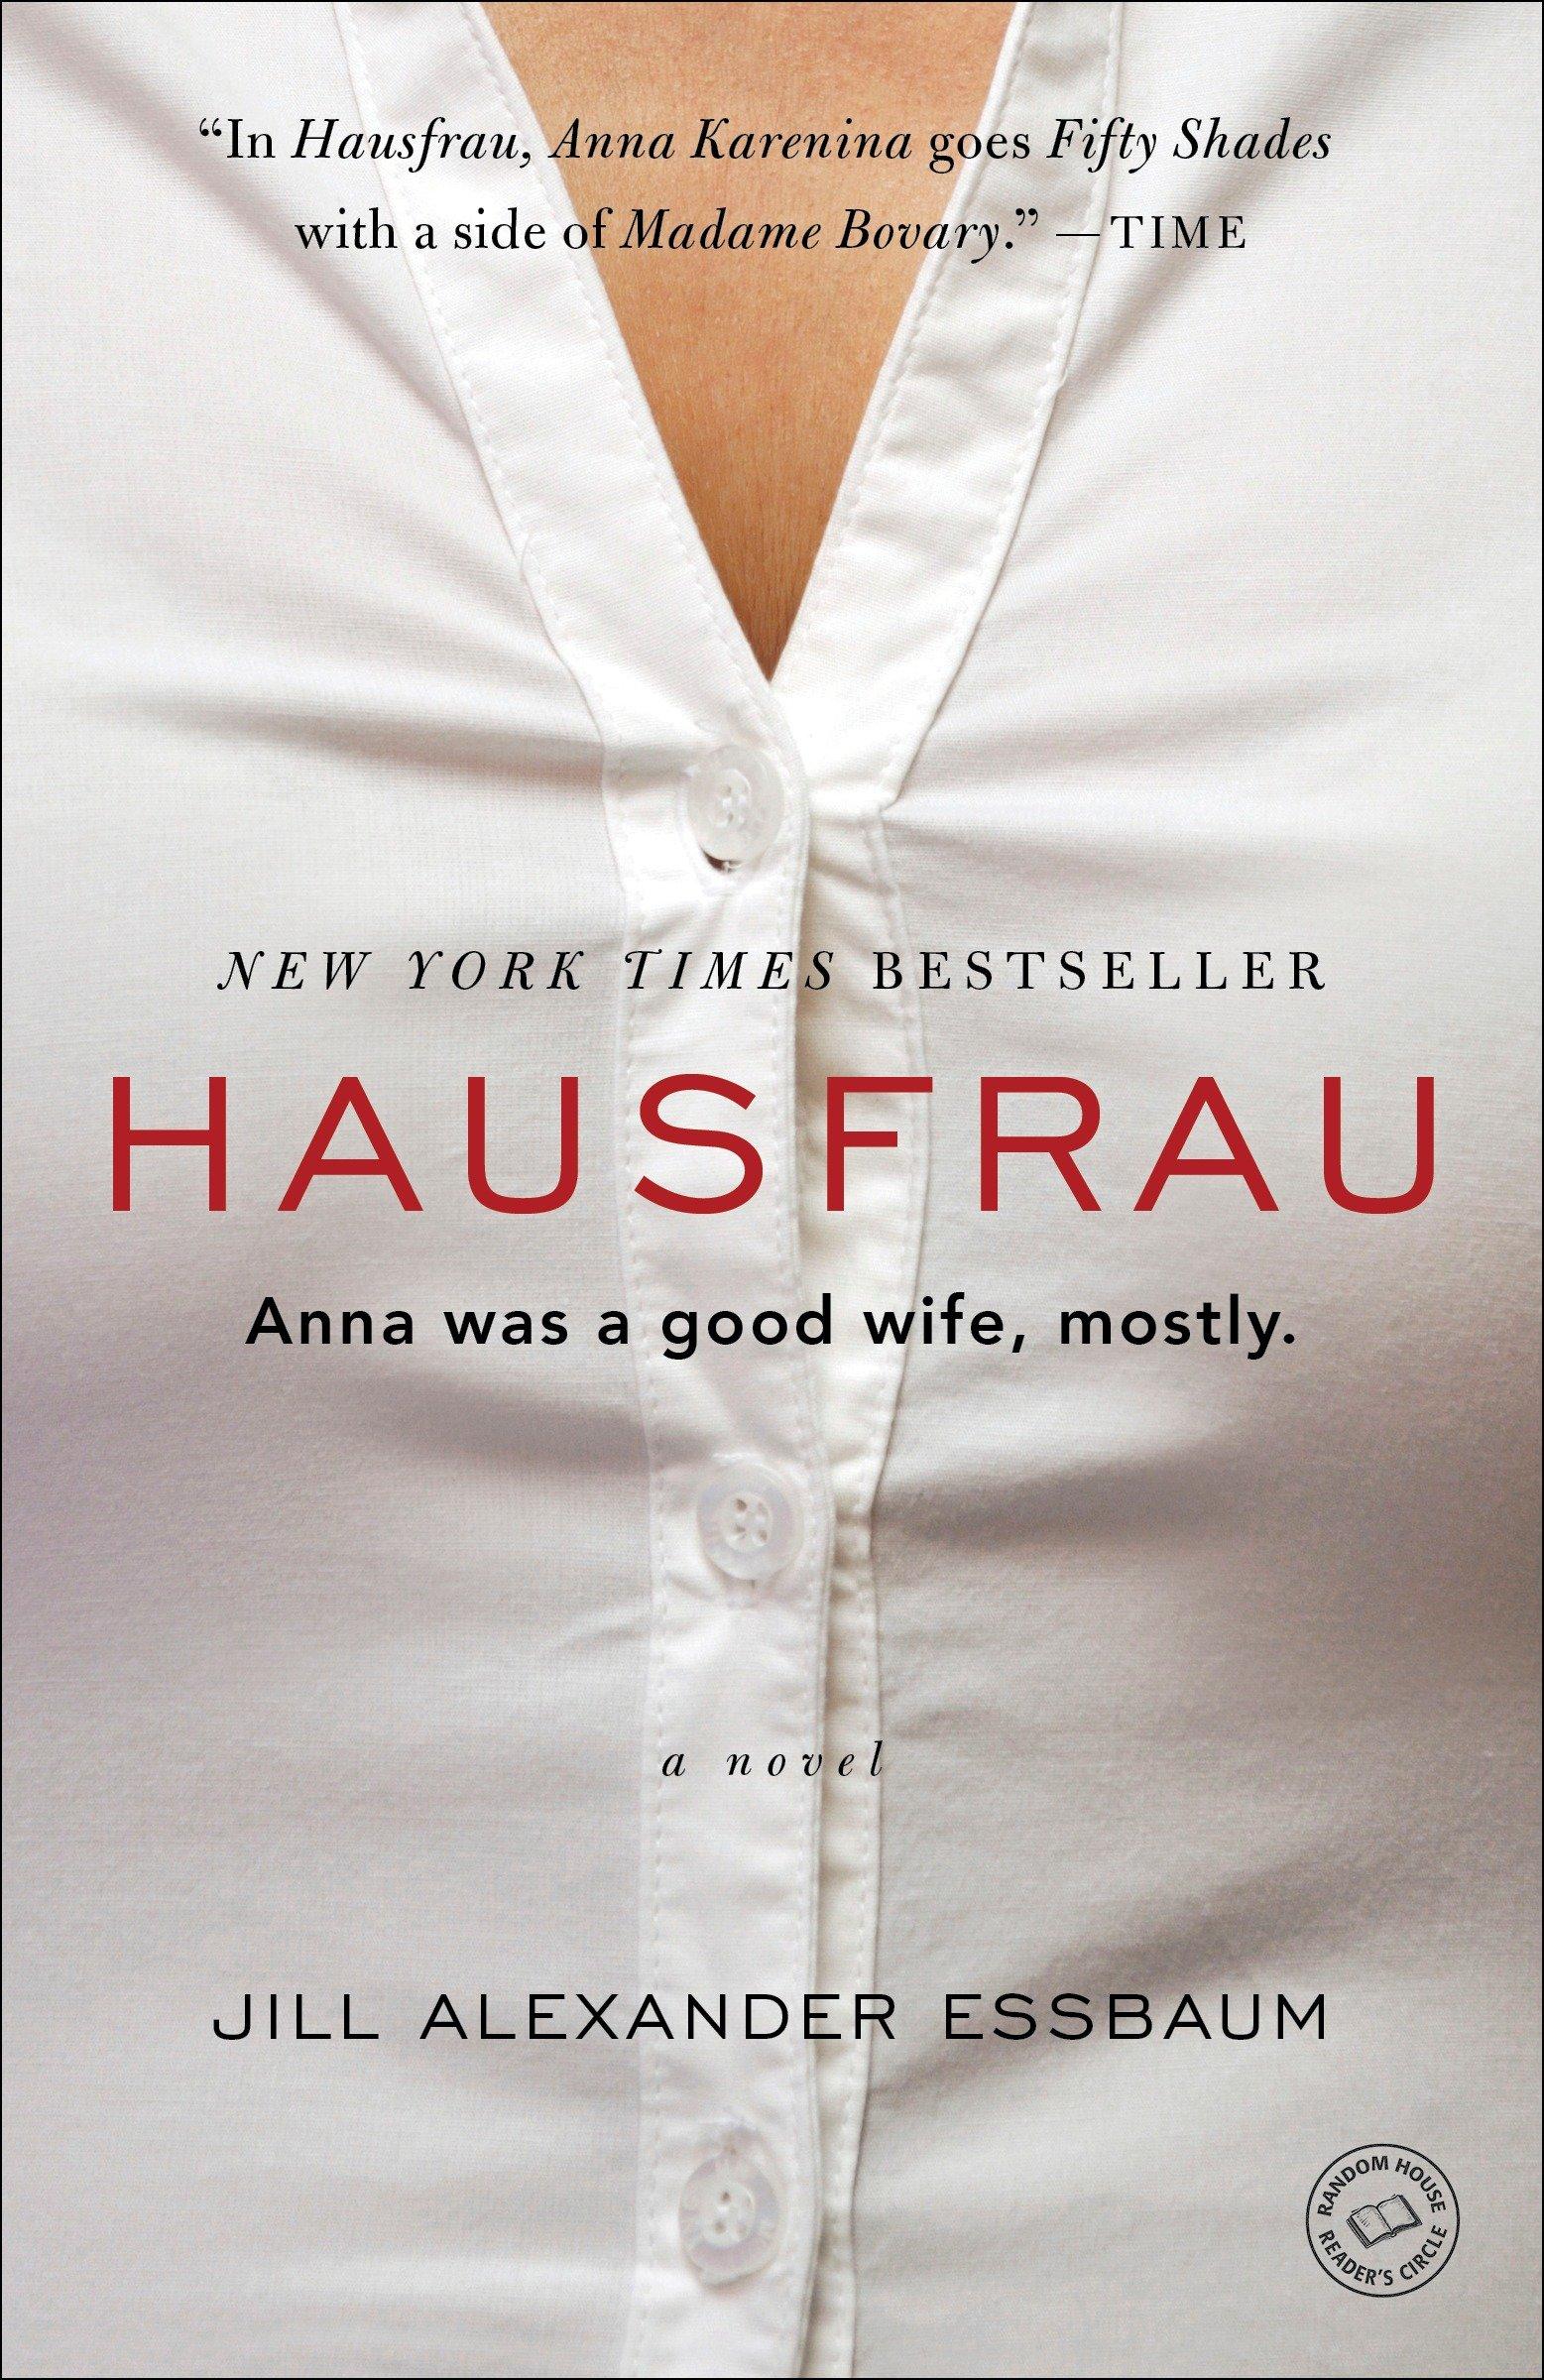 Cover Image of Hausfrau